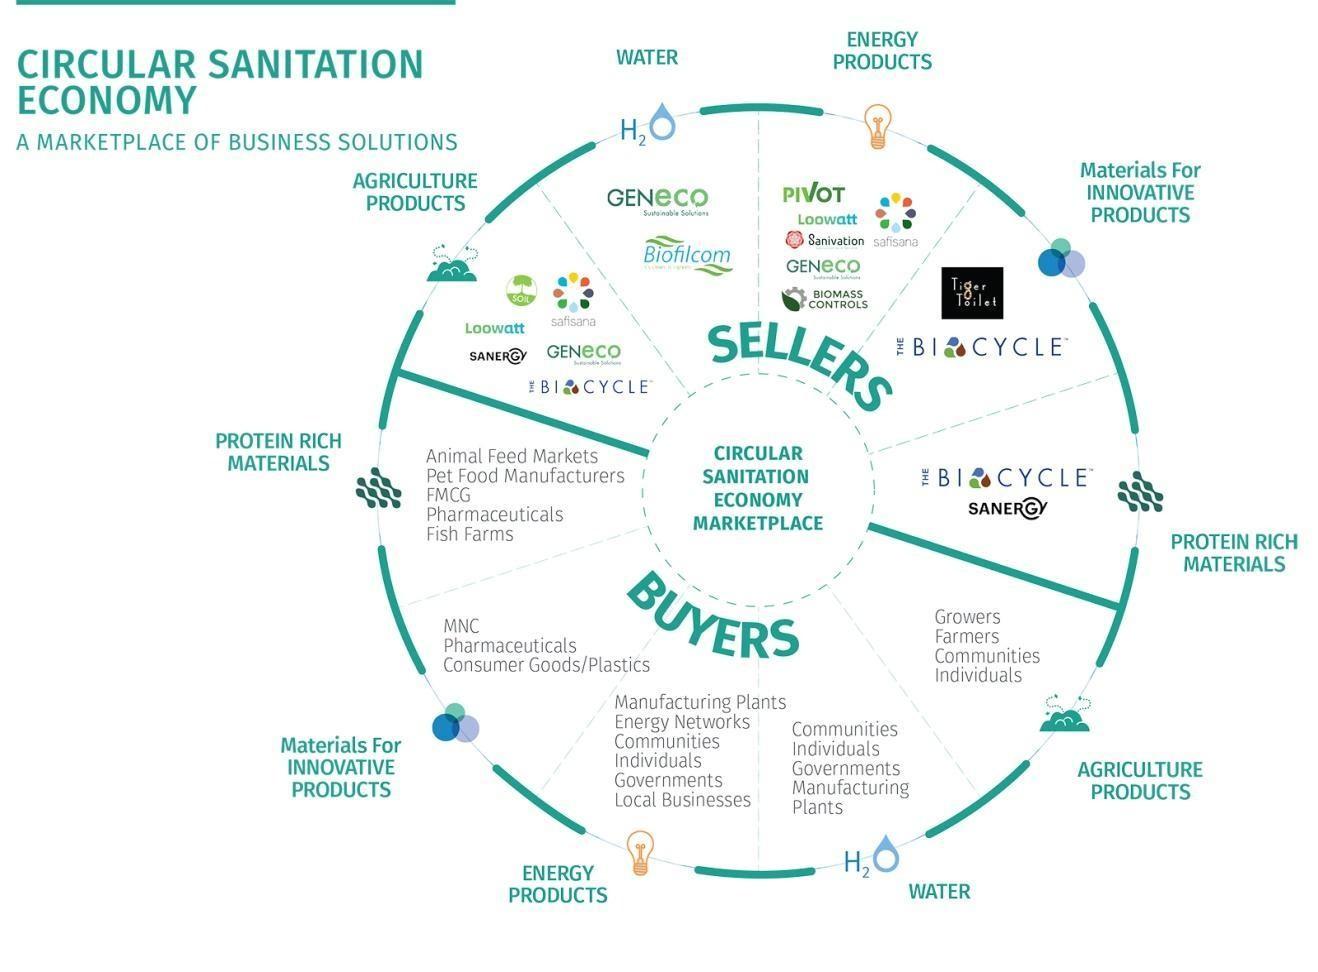 The circular sanitation economy.